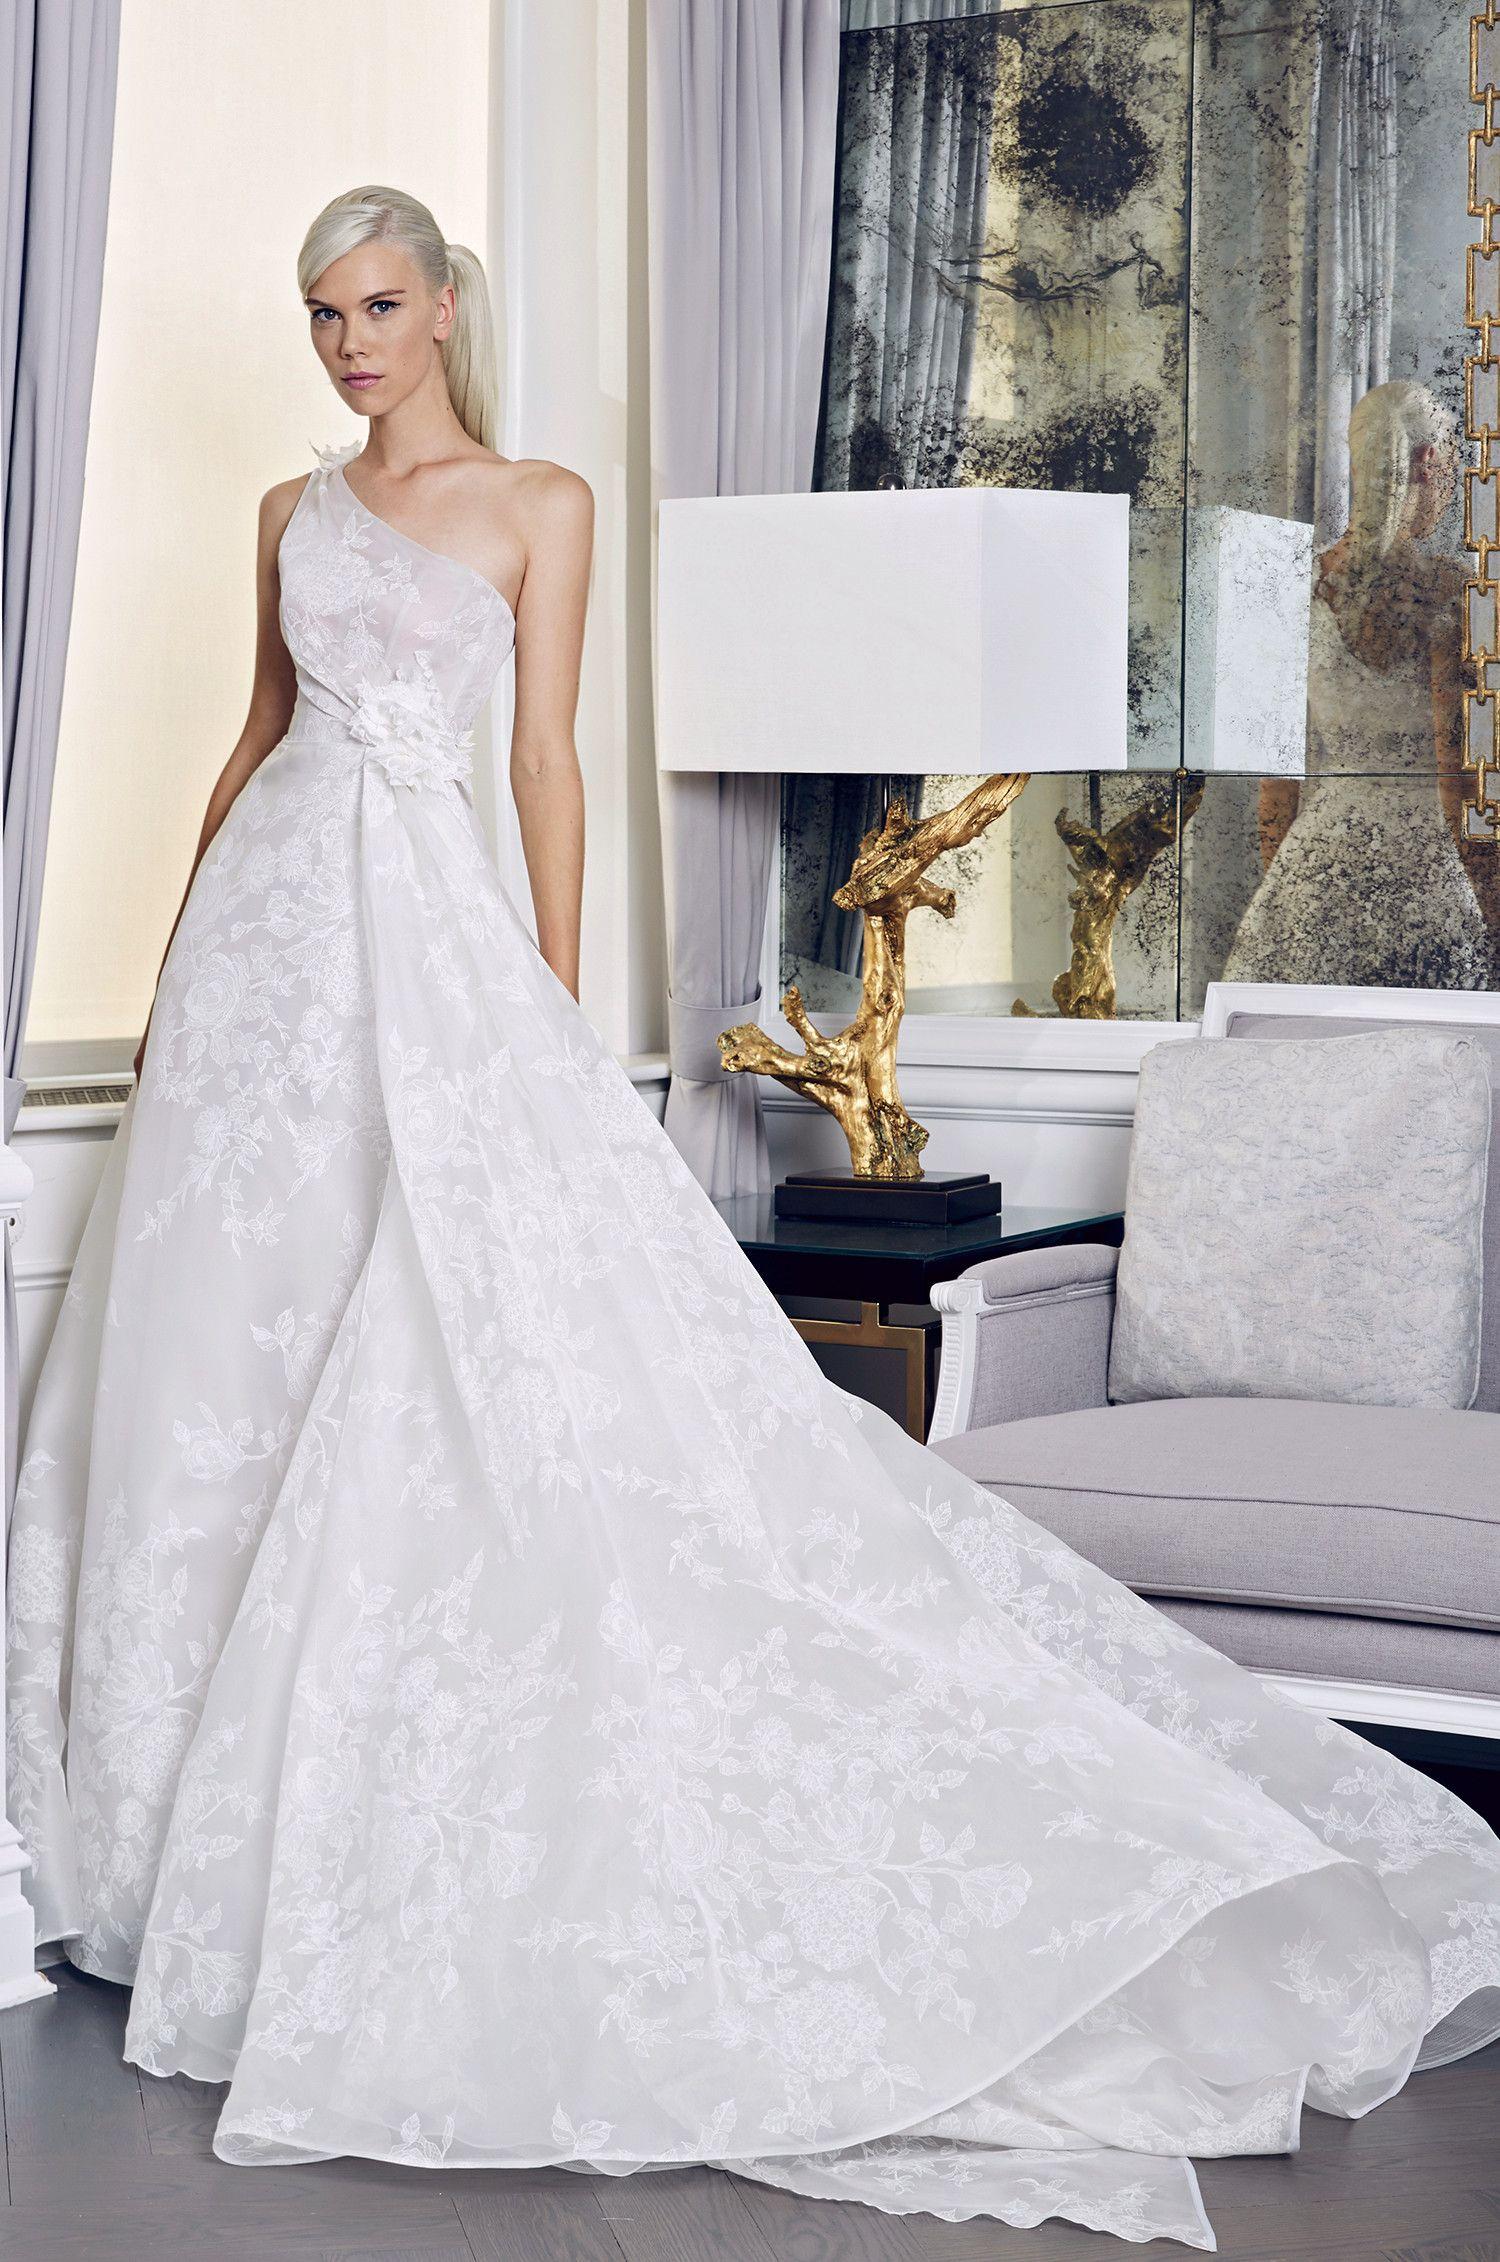 Oneshoulder floral wedding dress with cinched waistline freedom